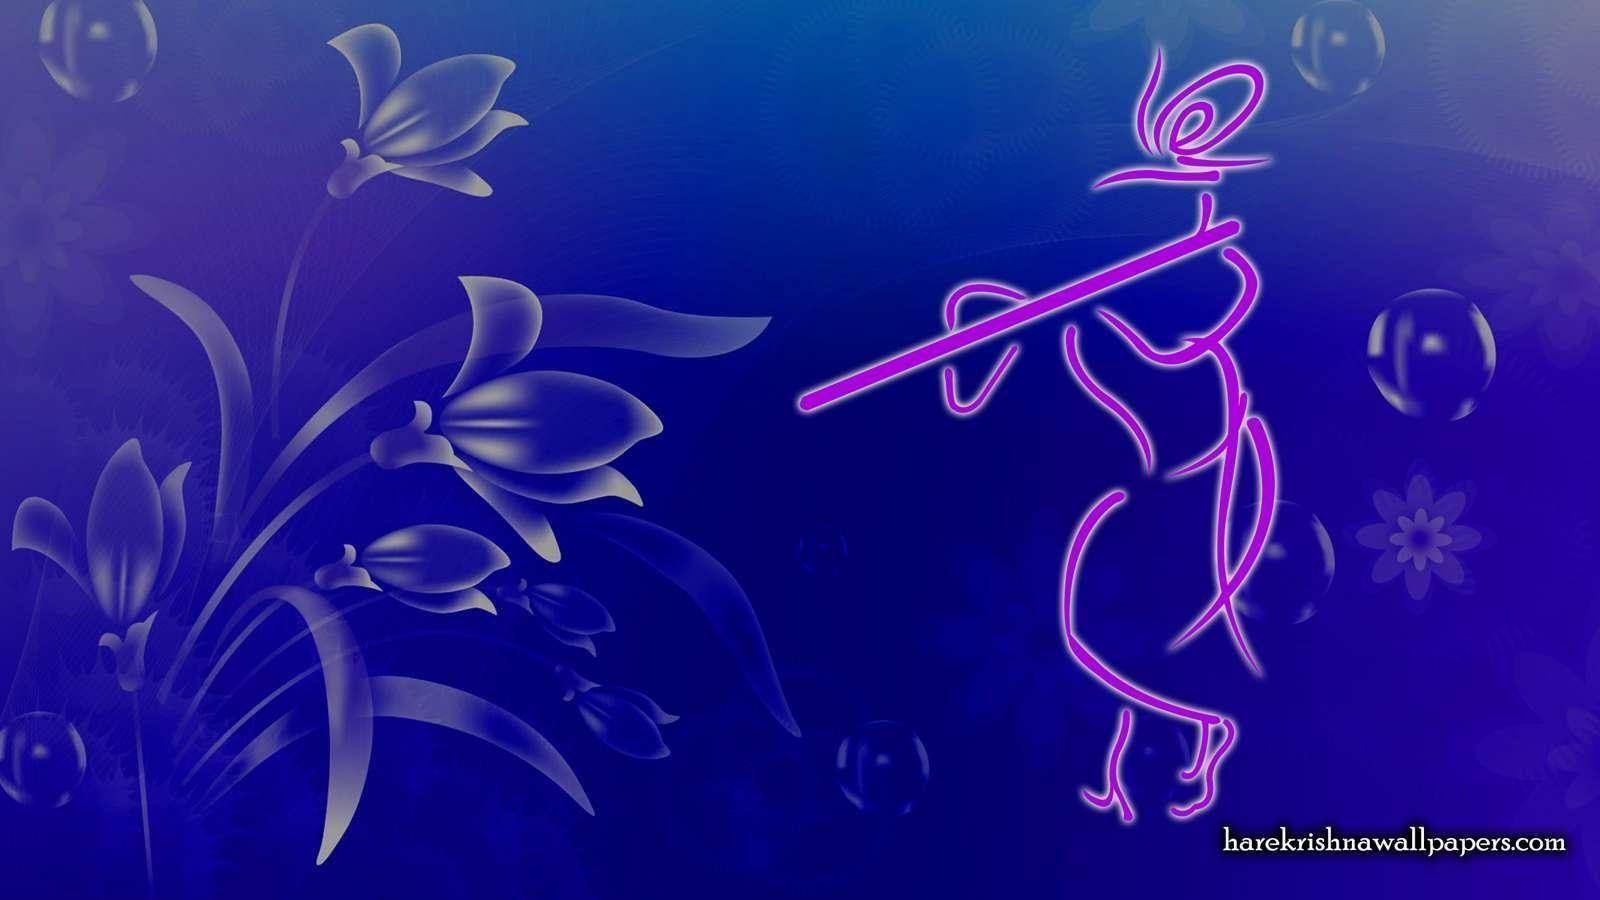 Wallpaper Flute Wallpaper Size Download Hare Krishna Wallpapers ...